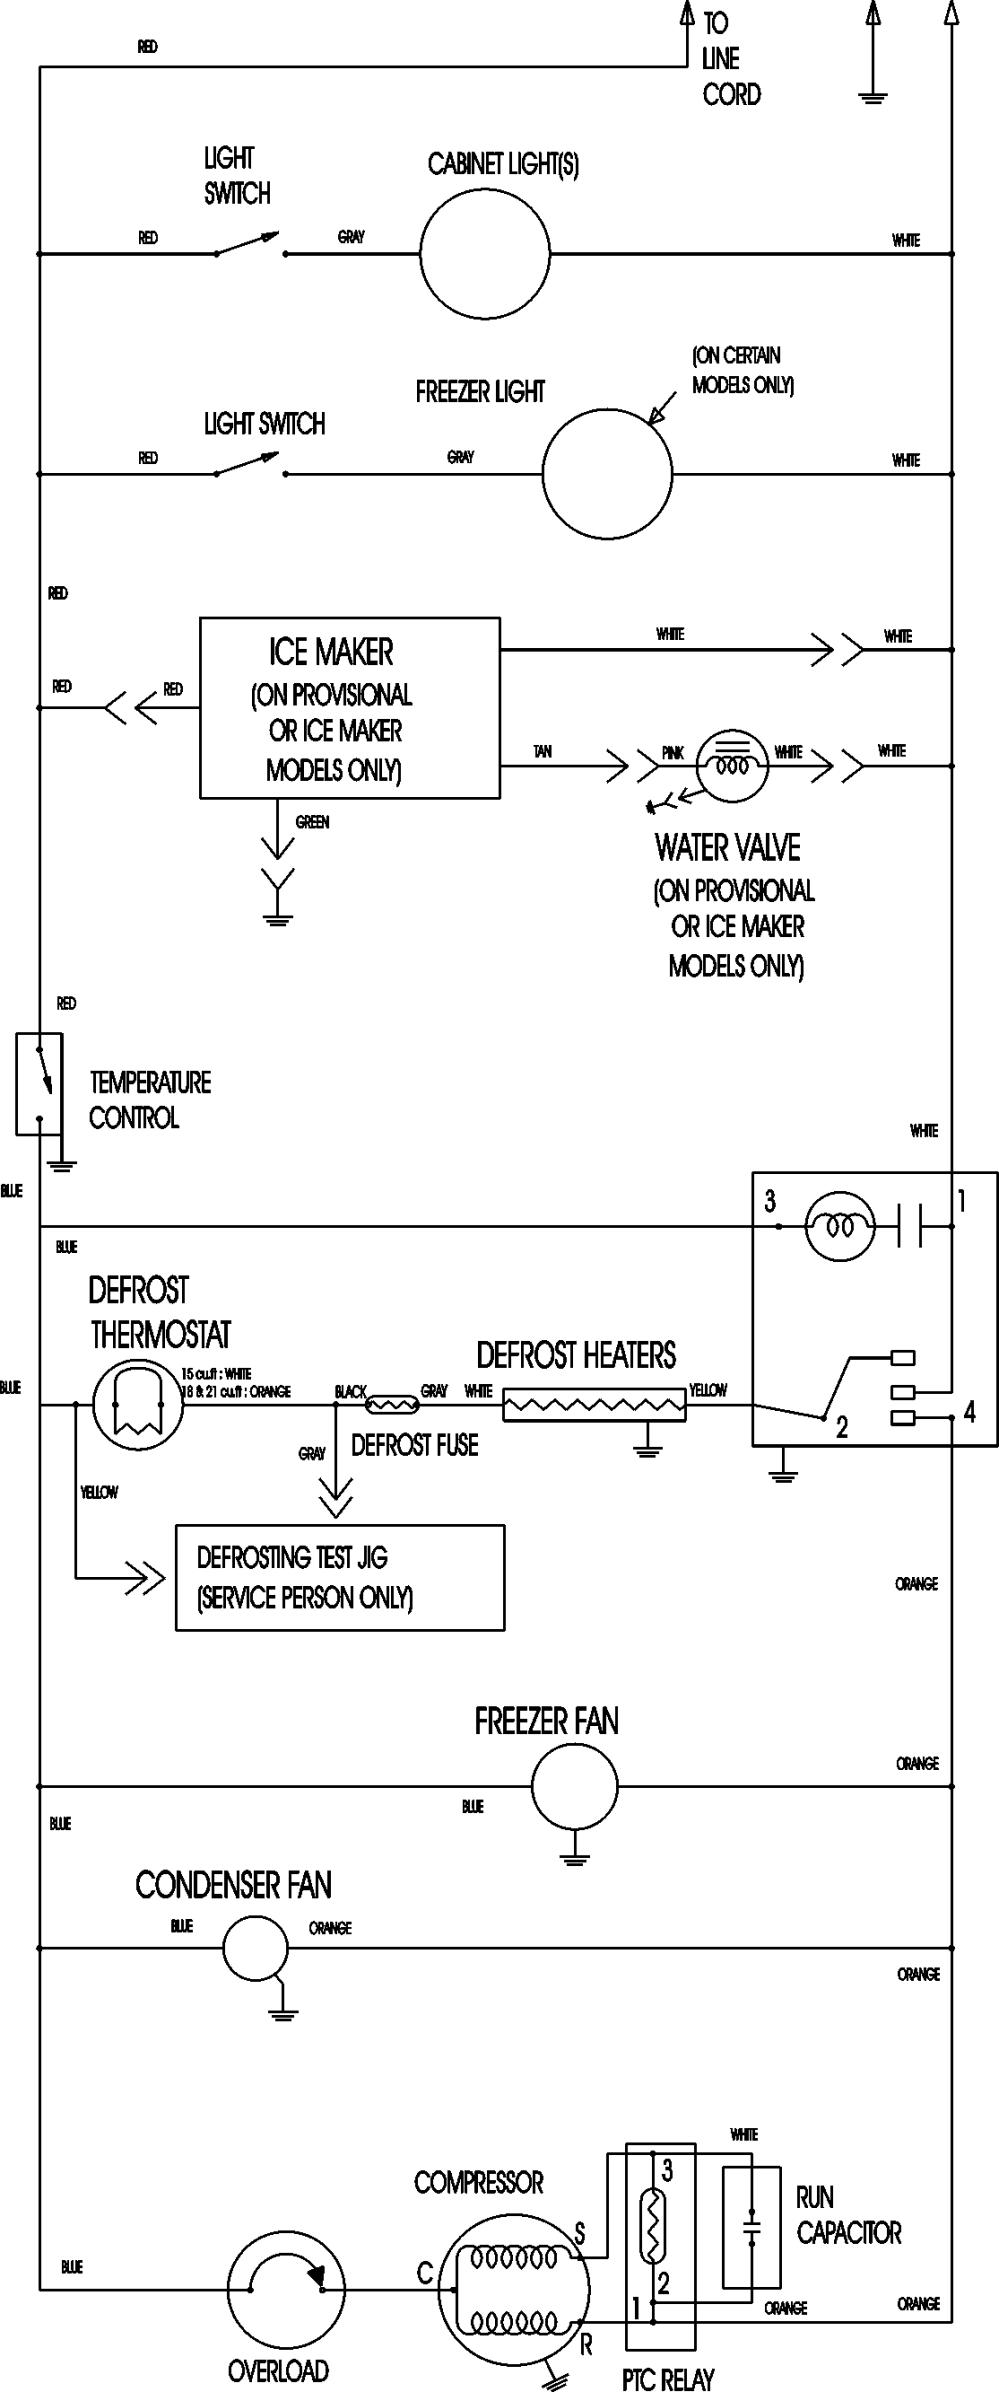 medium resolution of refrigeration wiring images